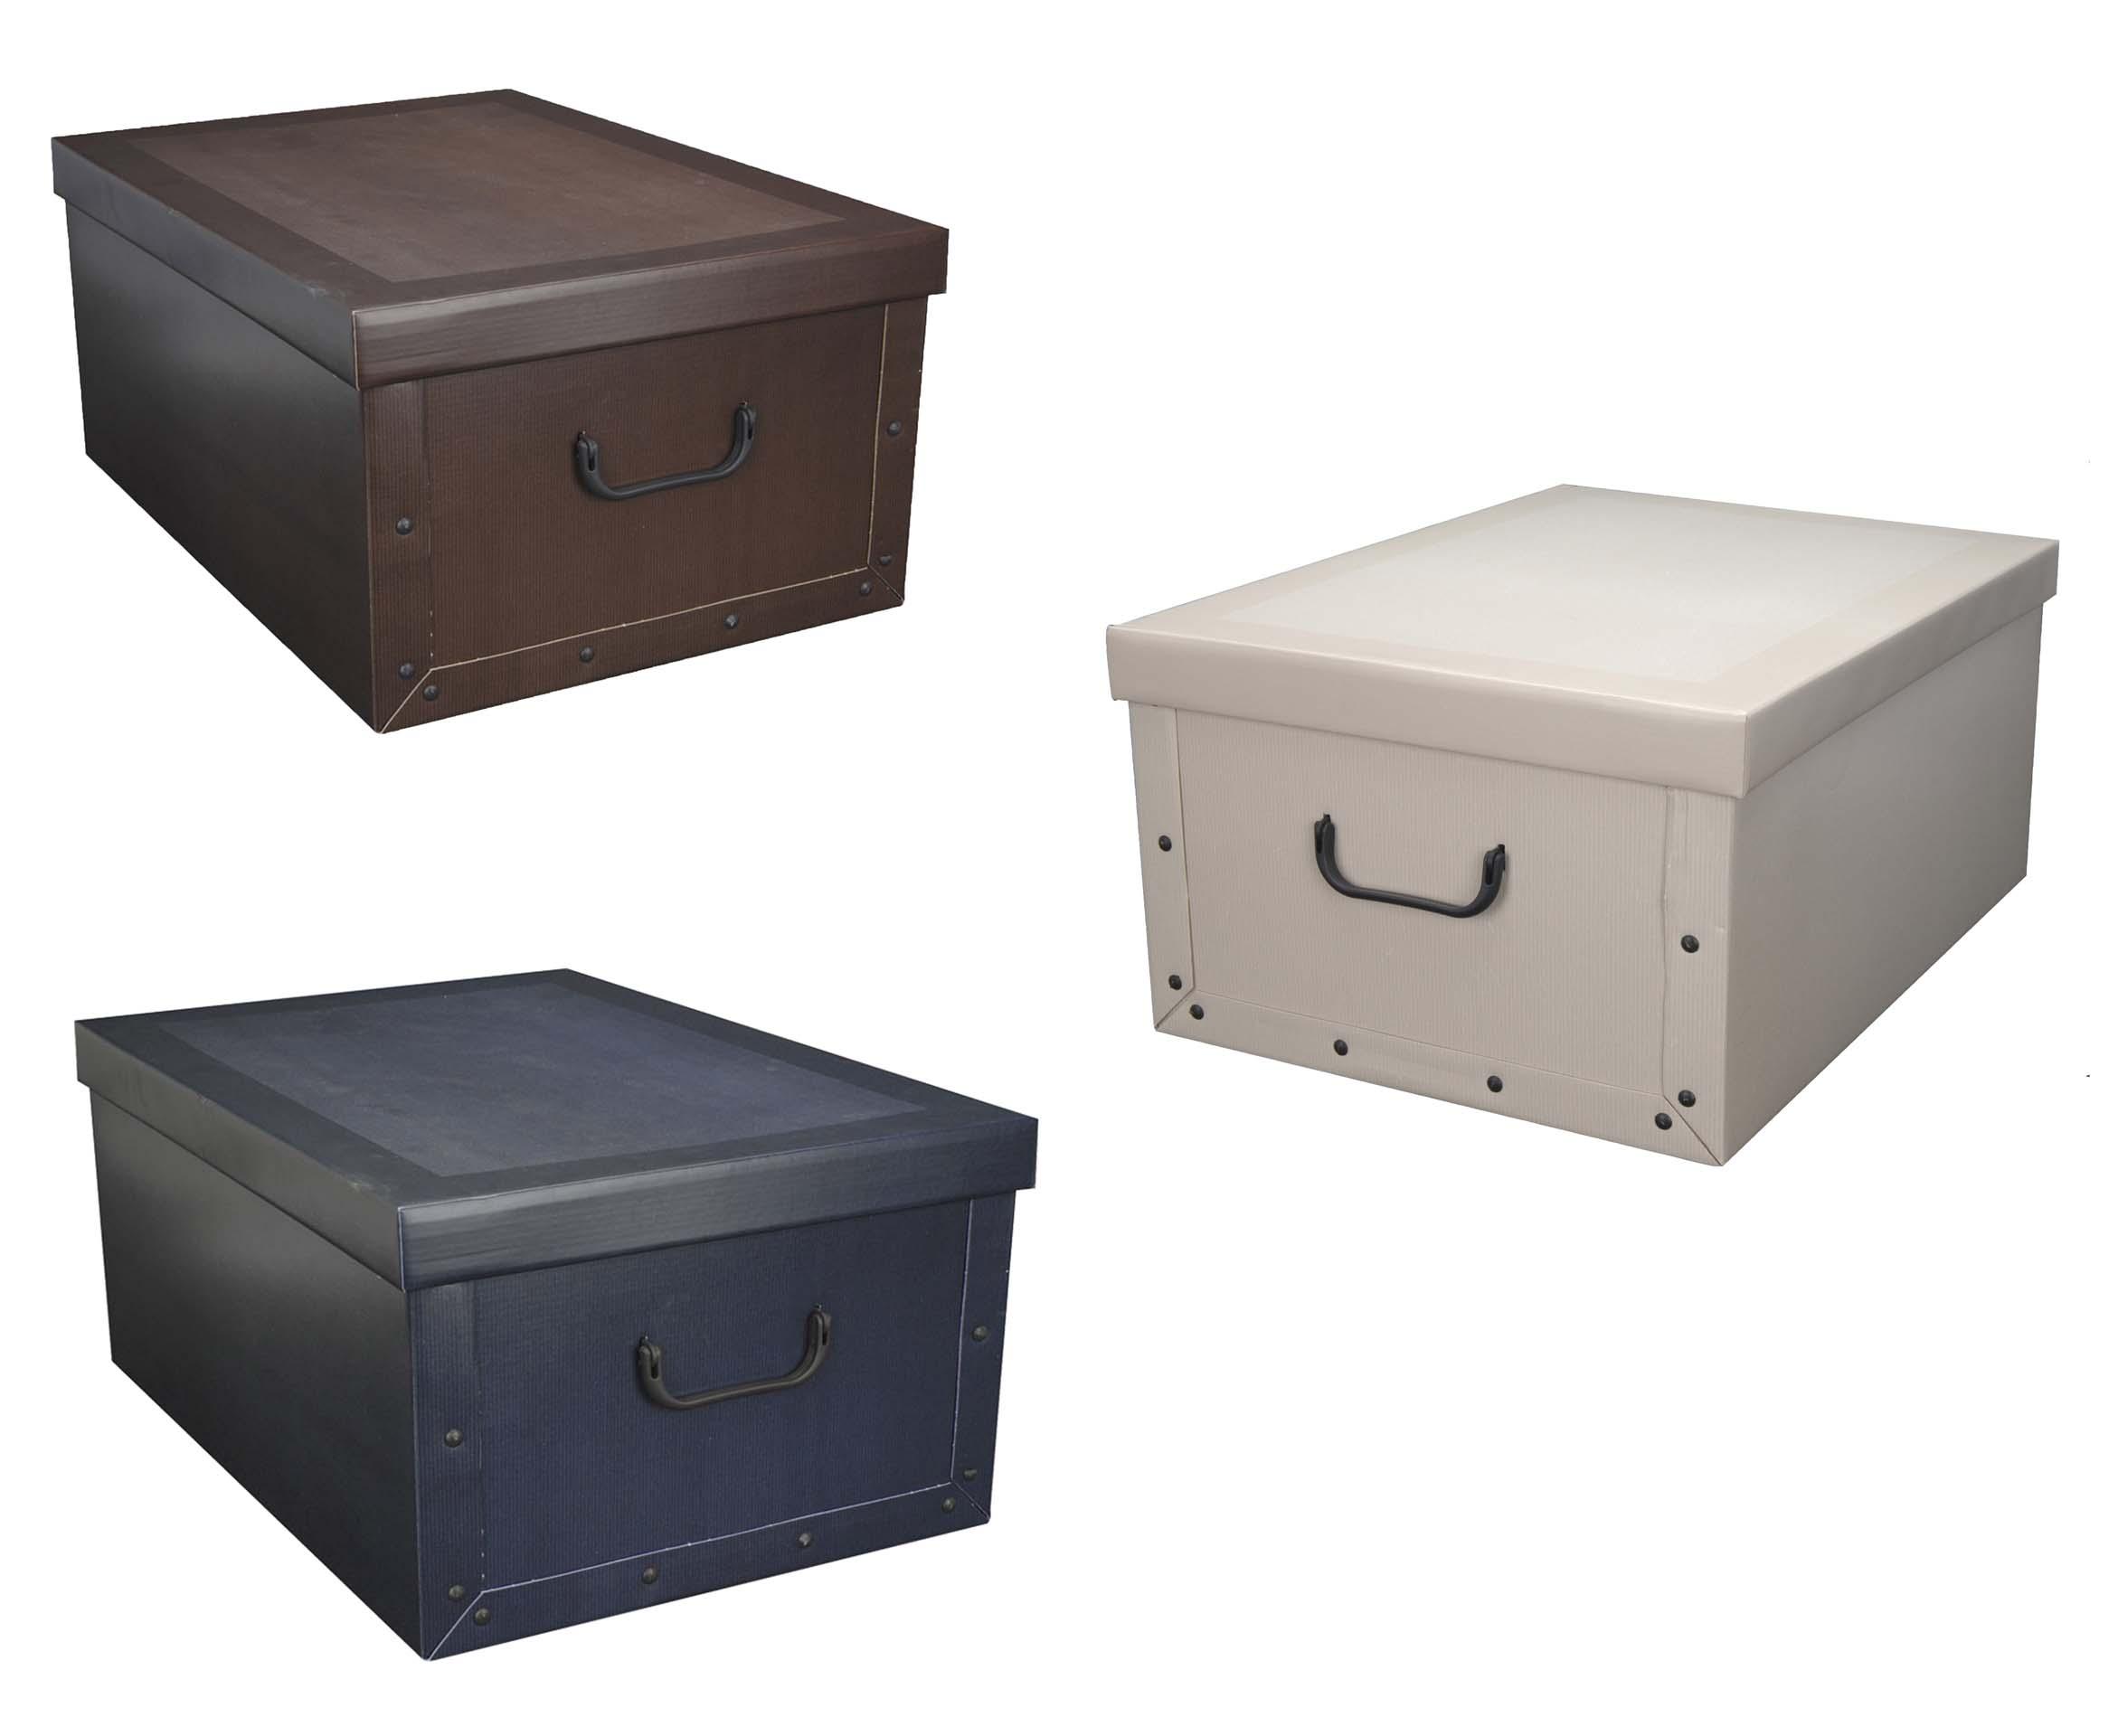 2x aufbewahrungs box mit deckel classicmuster kiste karton. Black Bedroom Furniture Sets. Home Design Ideas